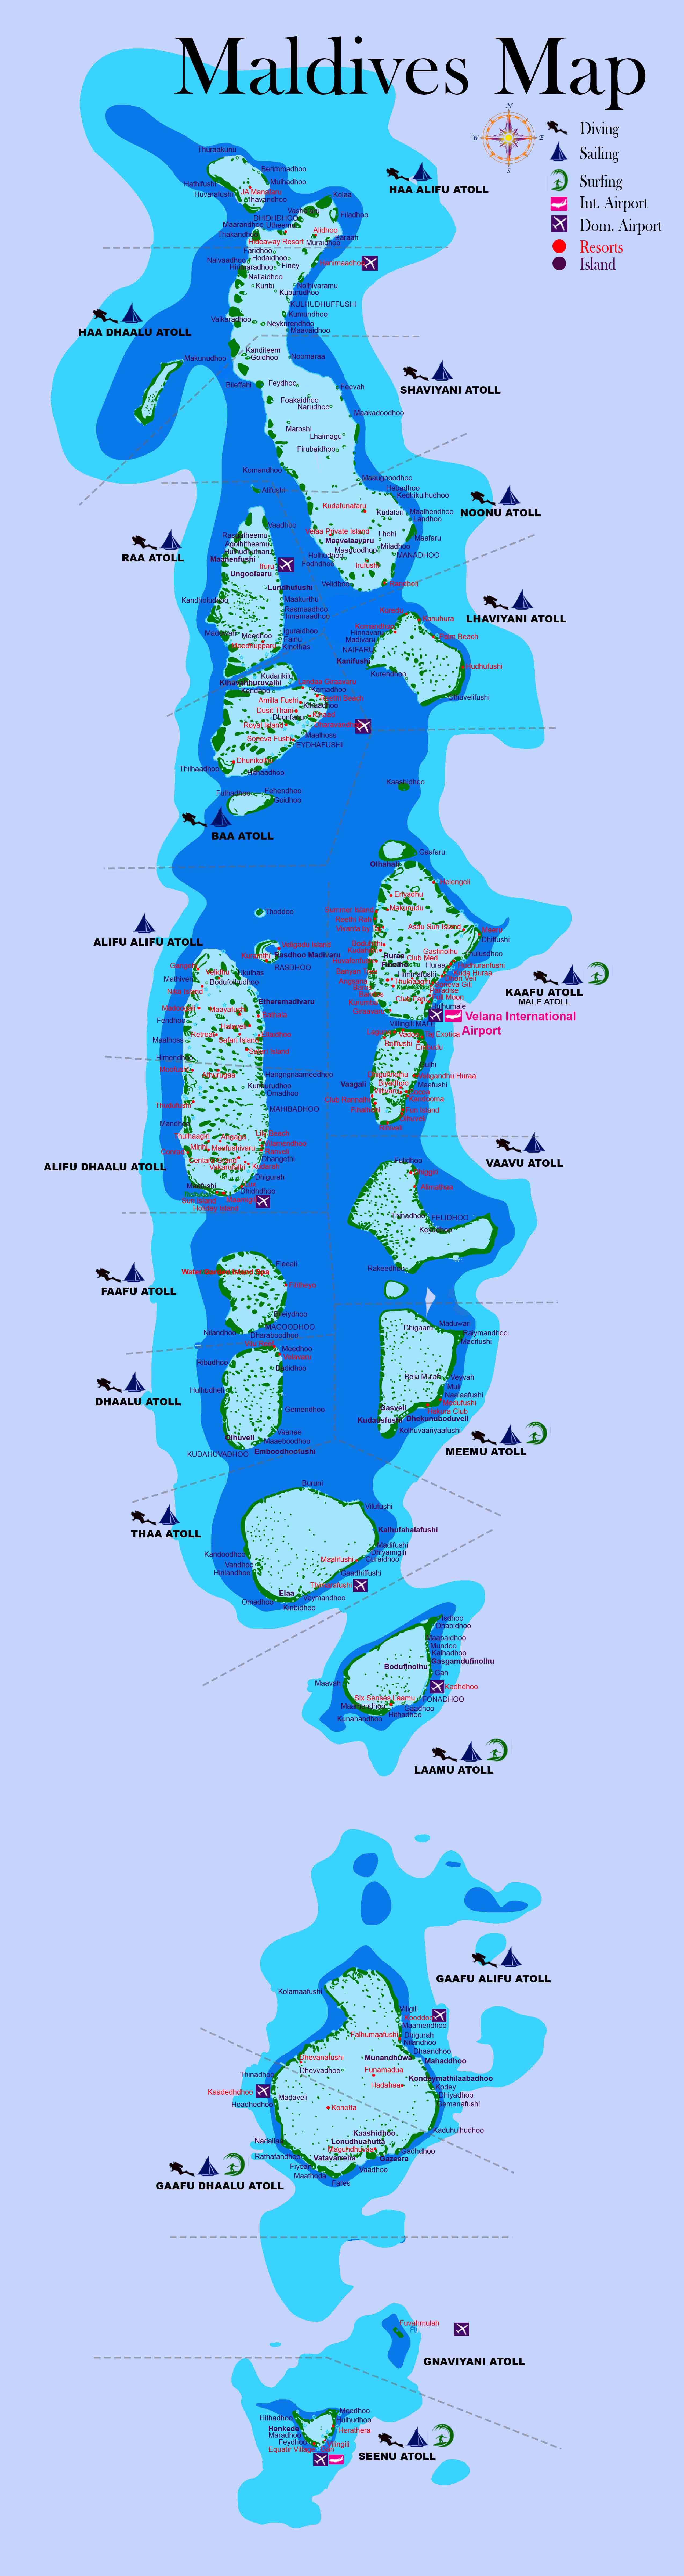 Maldives Map Full Where Is Maldives Visit Maldives